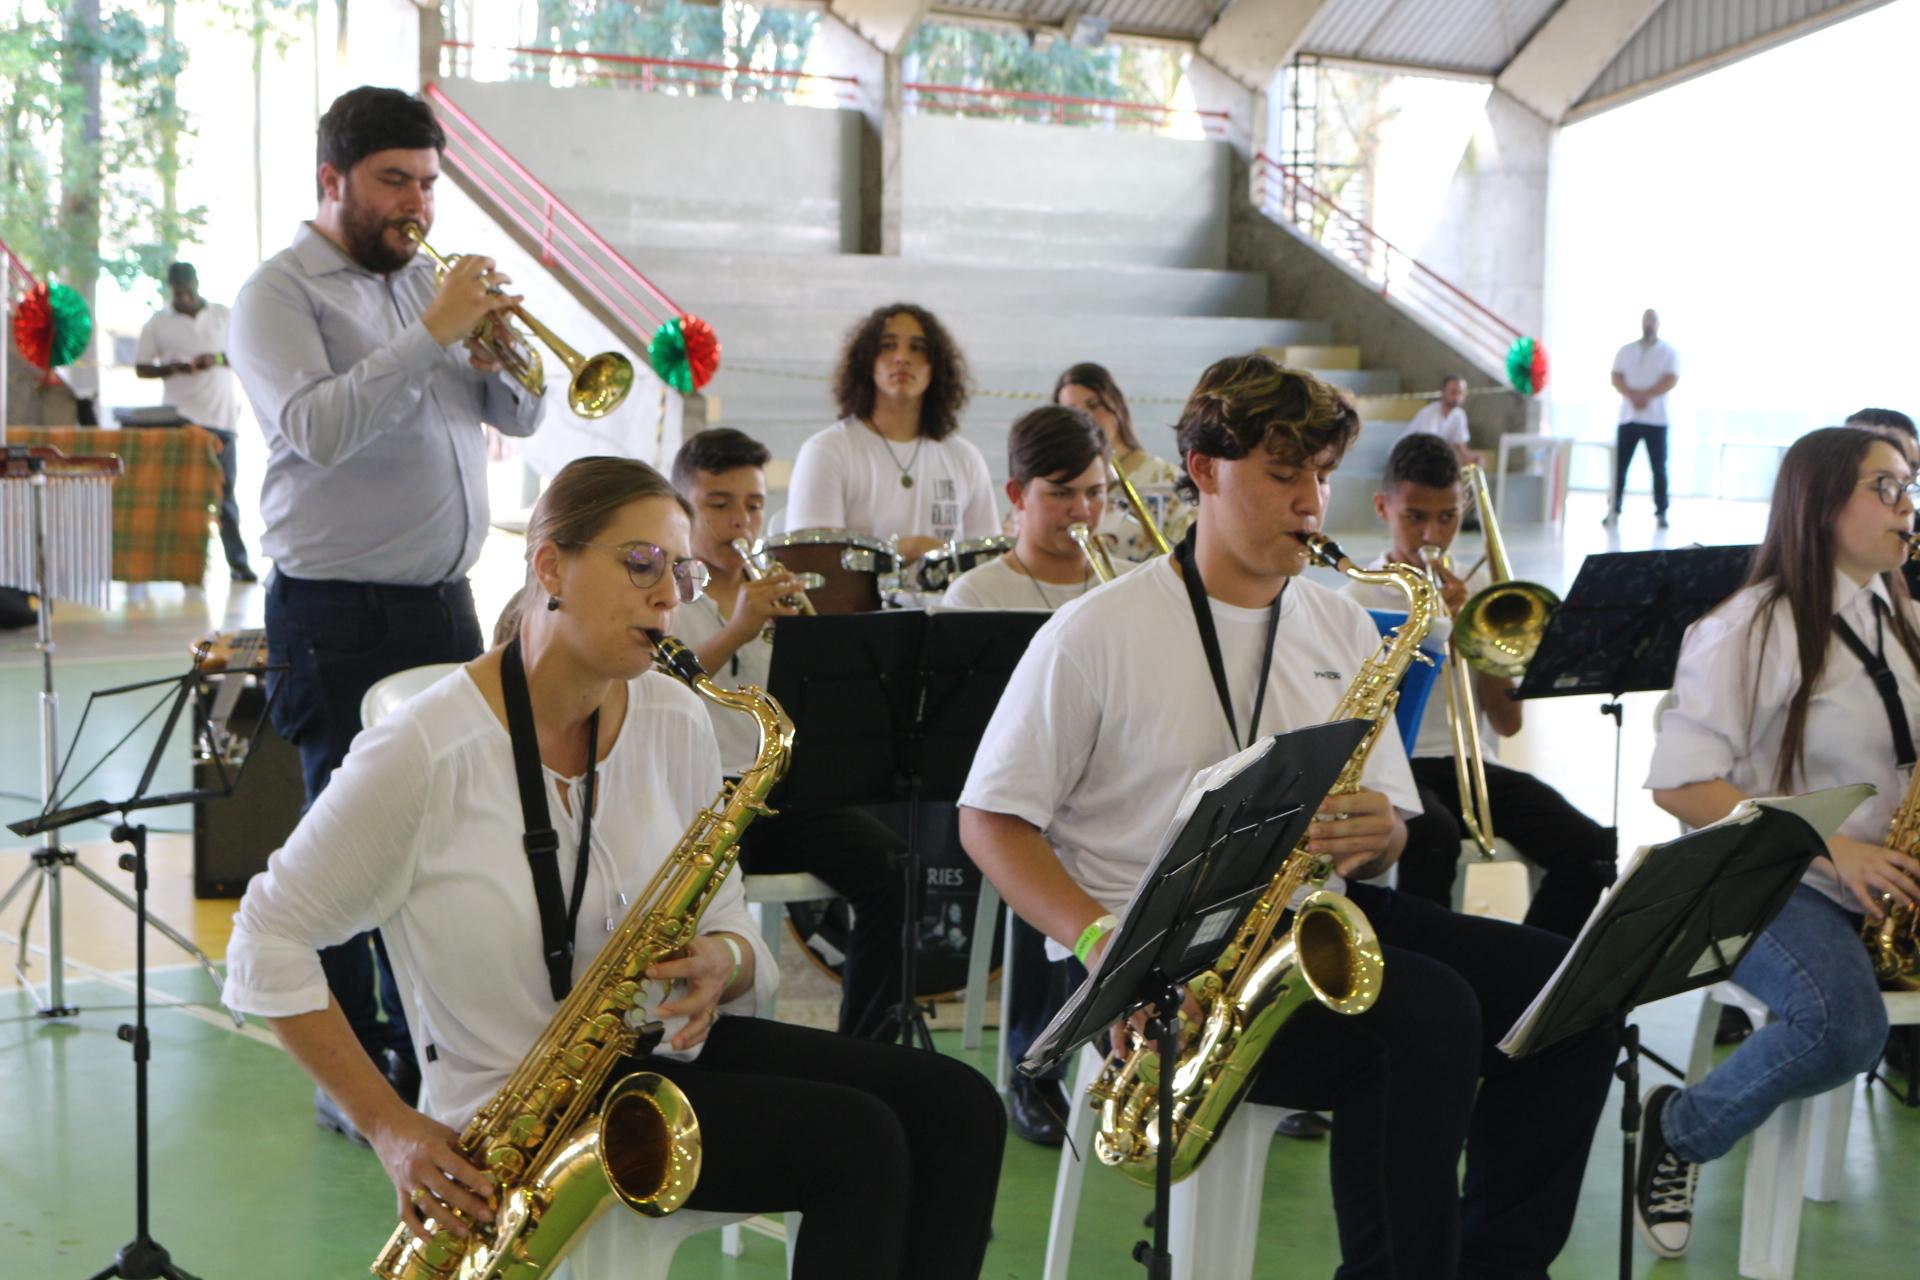 Doze bandas participam do Festival de Bandas de Sopro e Percussão